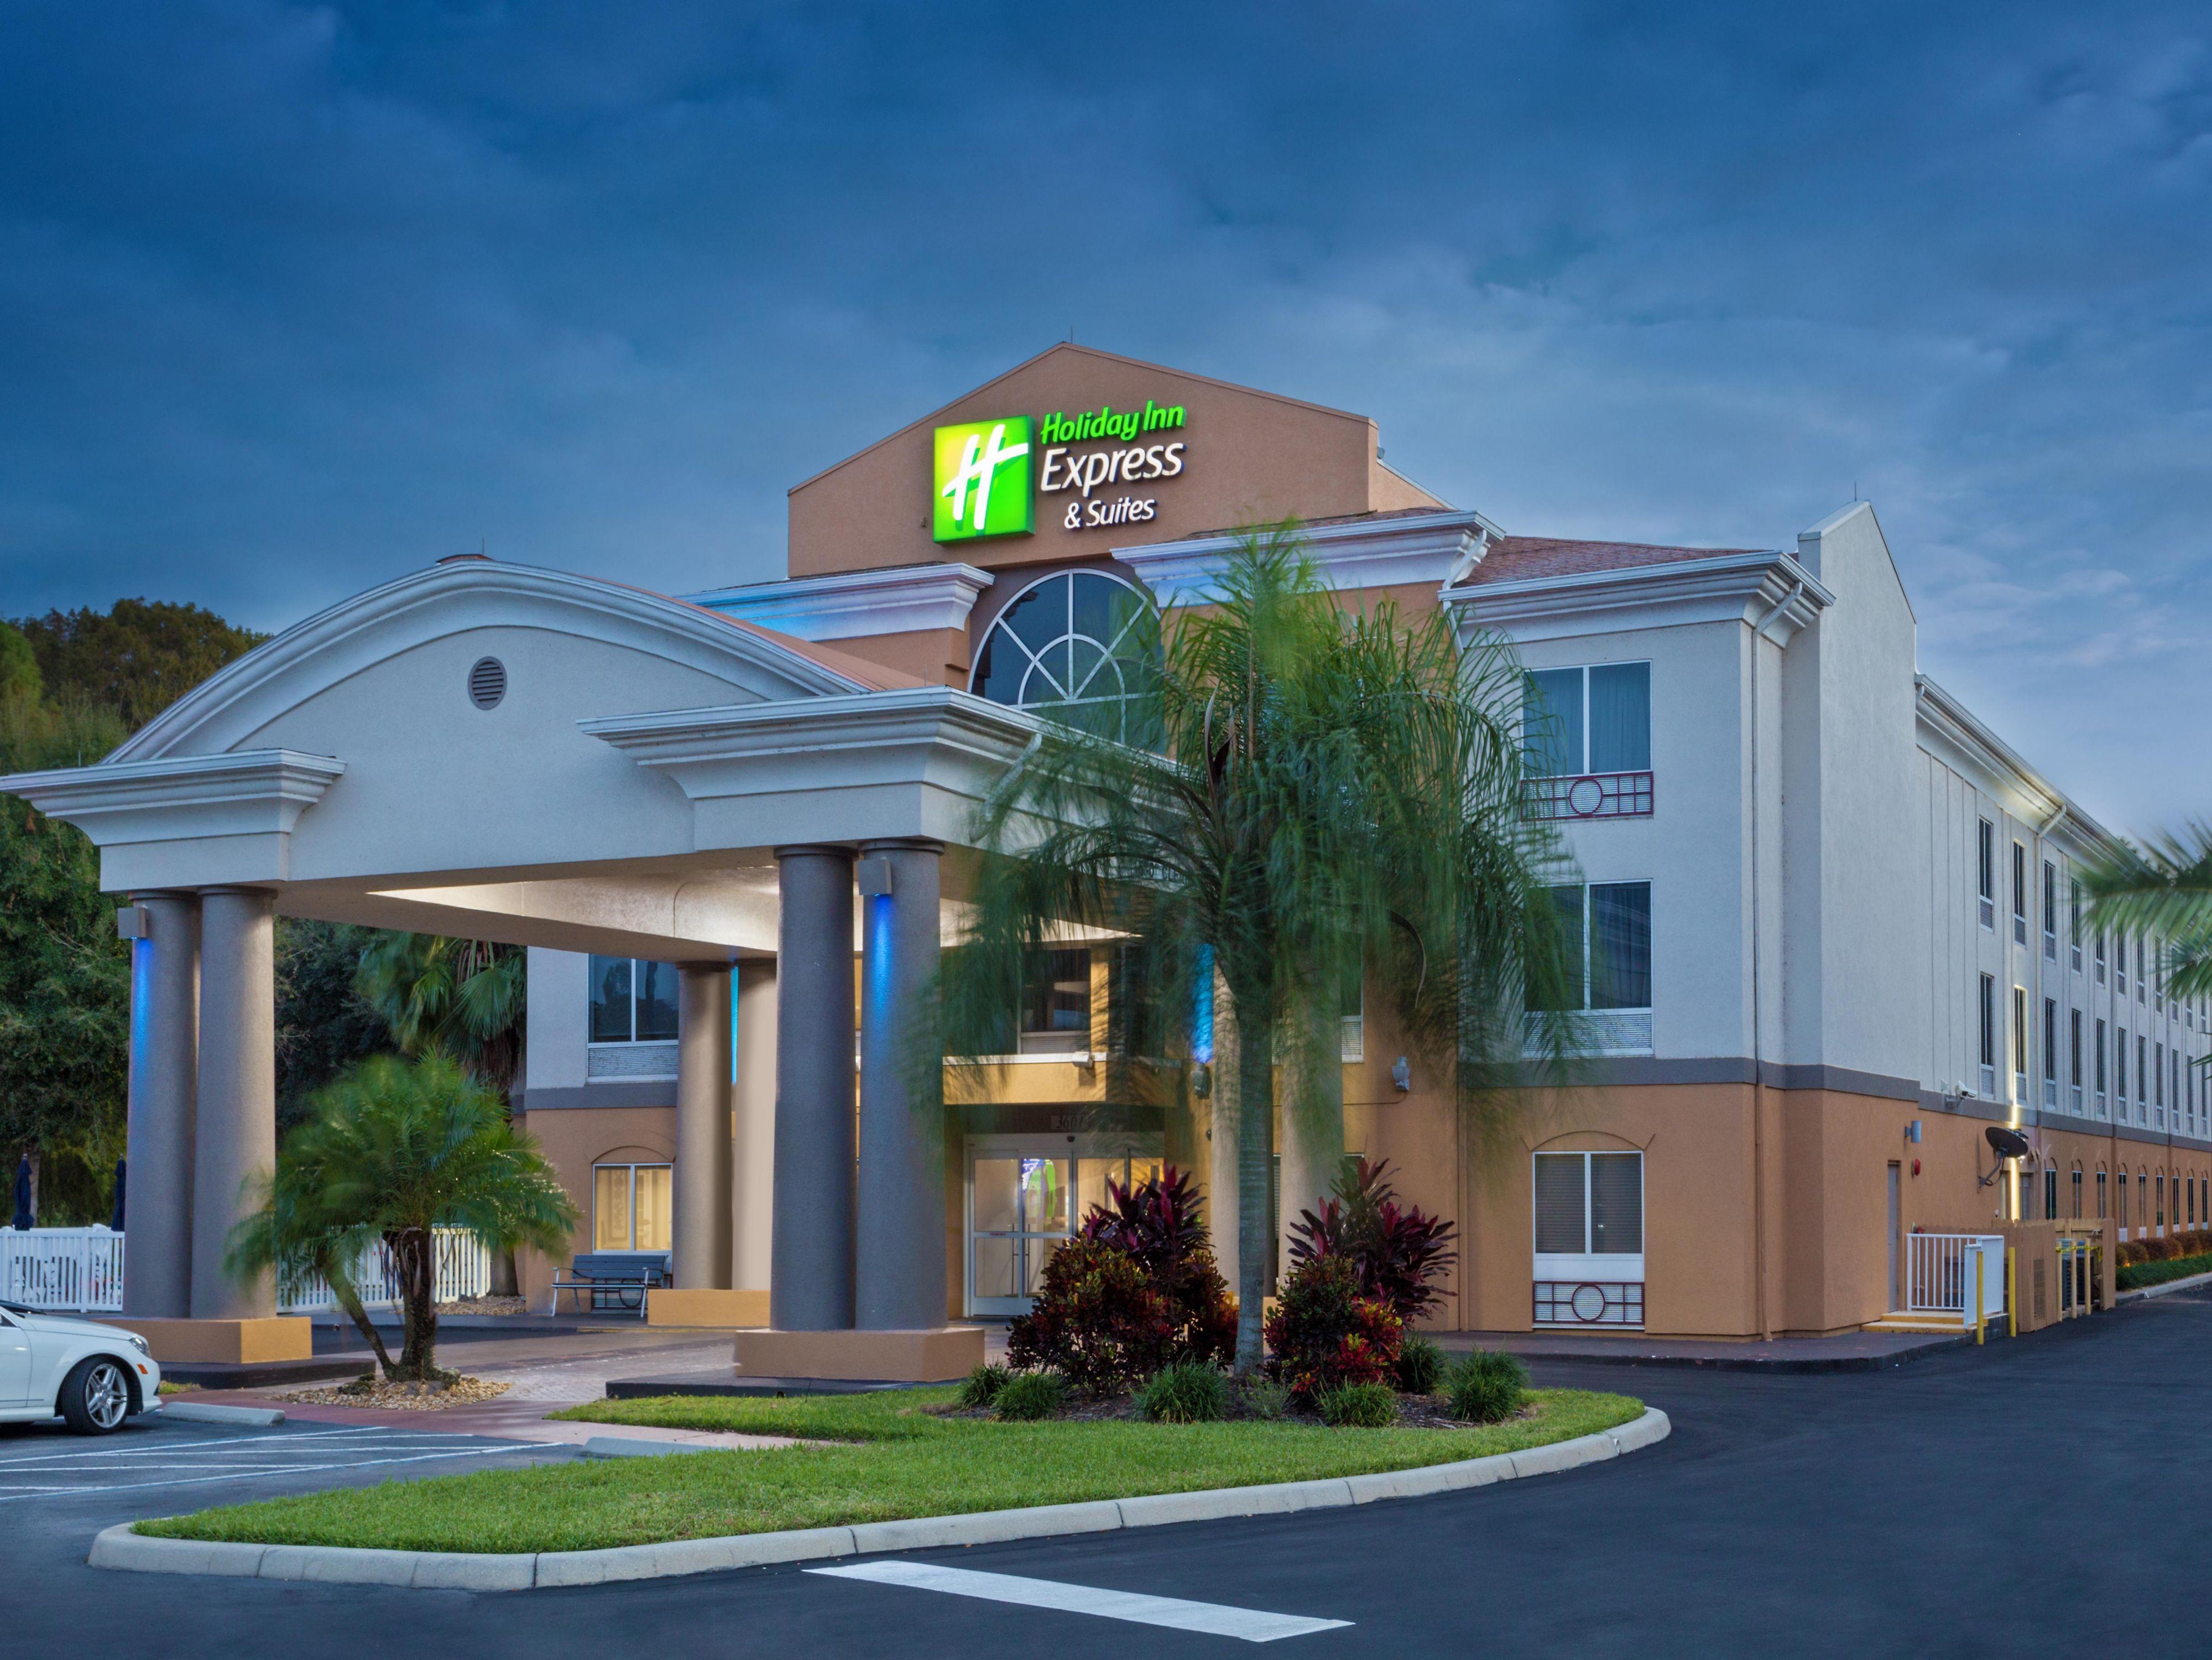 Holiday Inn Express & Suites Tavares - Leesburg Hotel by IHG